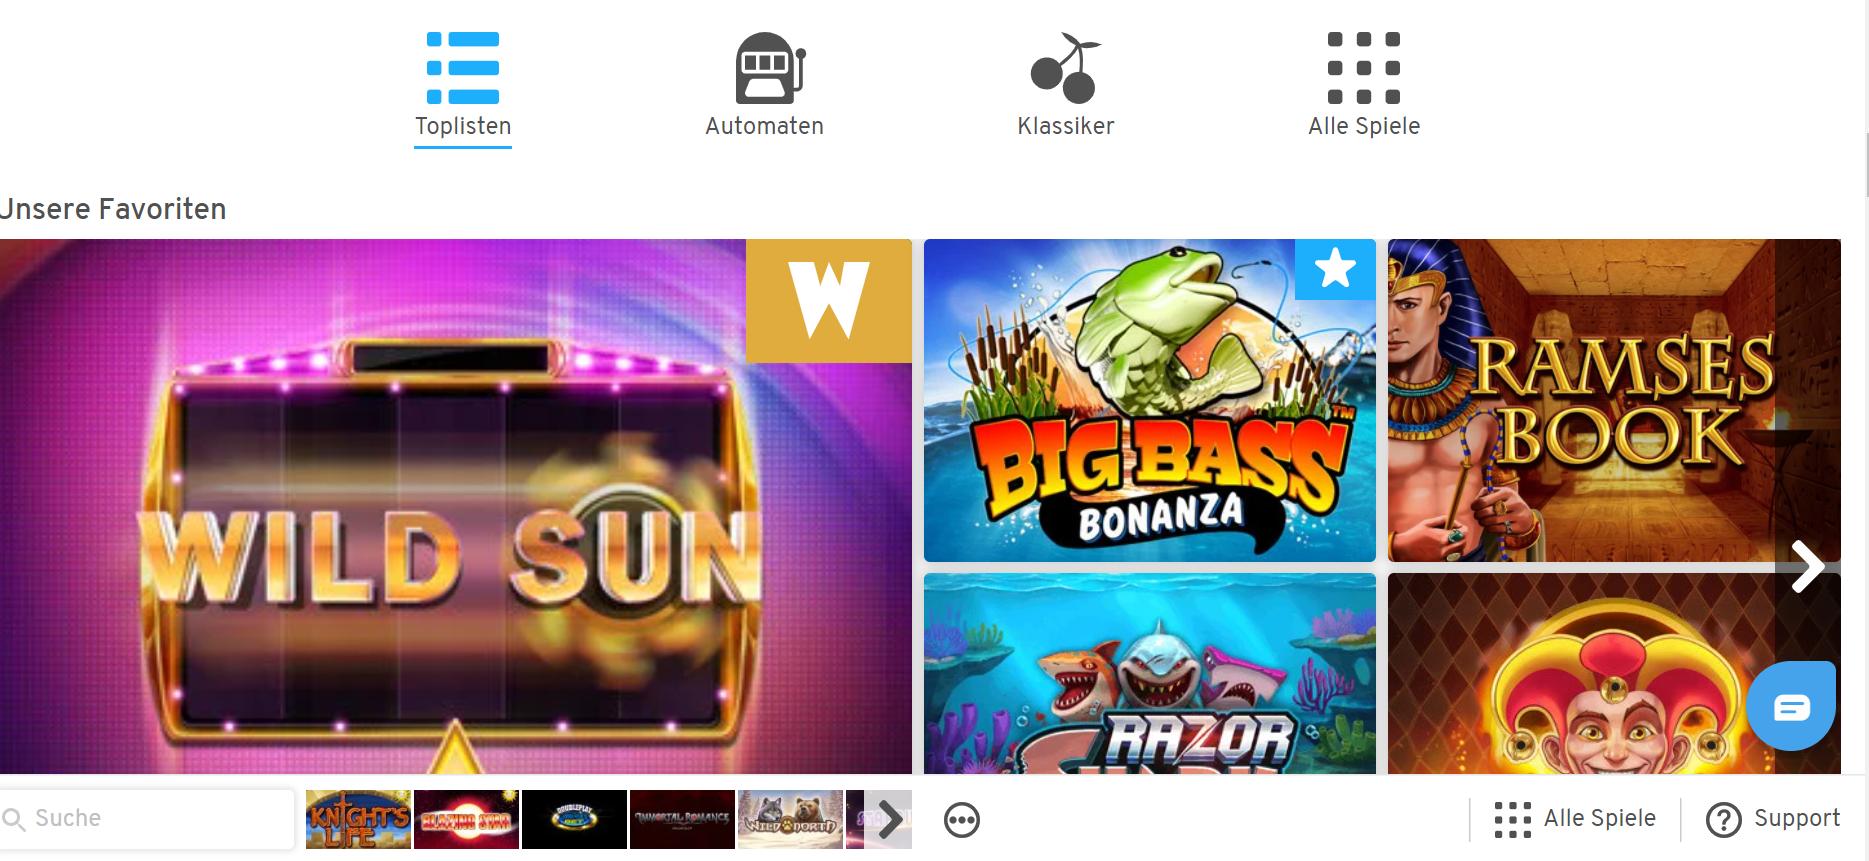 Wunderino Spiele Online-Spielothek